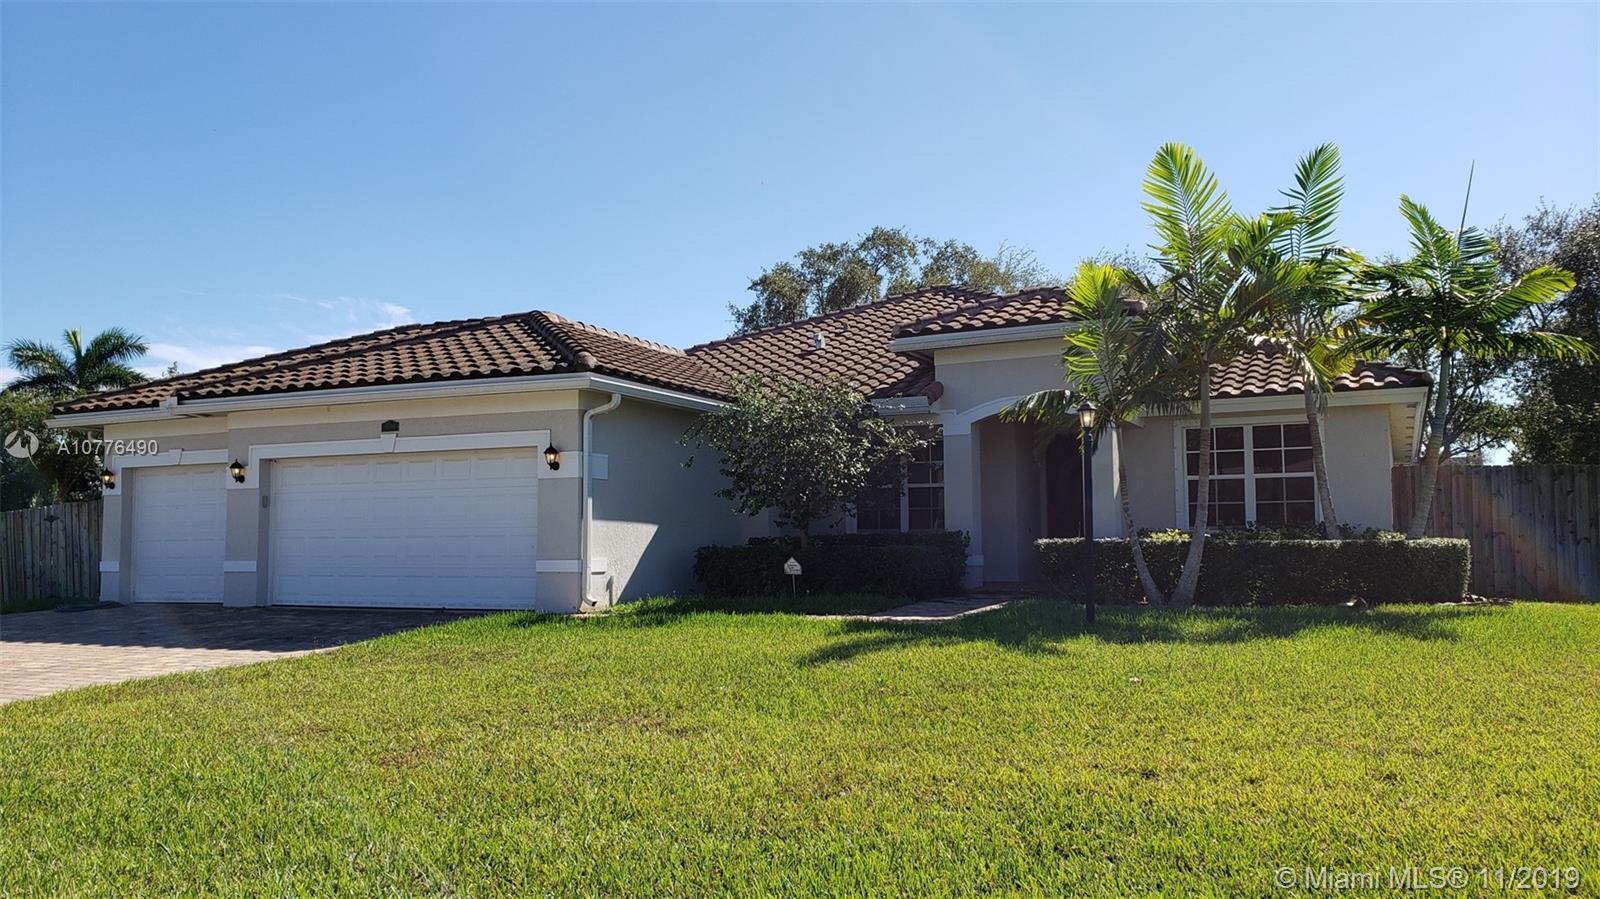 1740 NW 21st St, Homestead, FL 33030 - Homestead, FL real estate listing